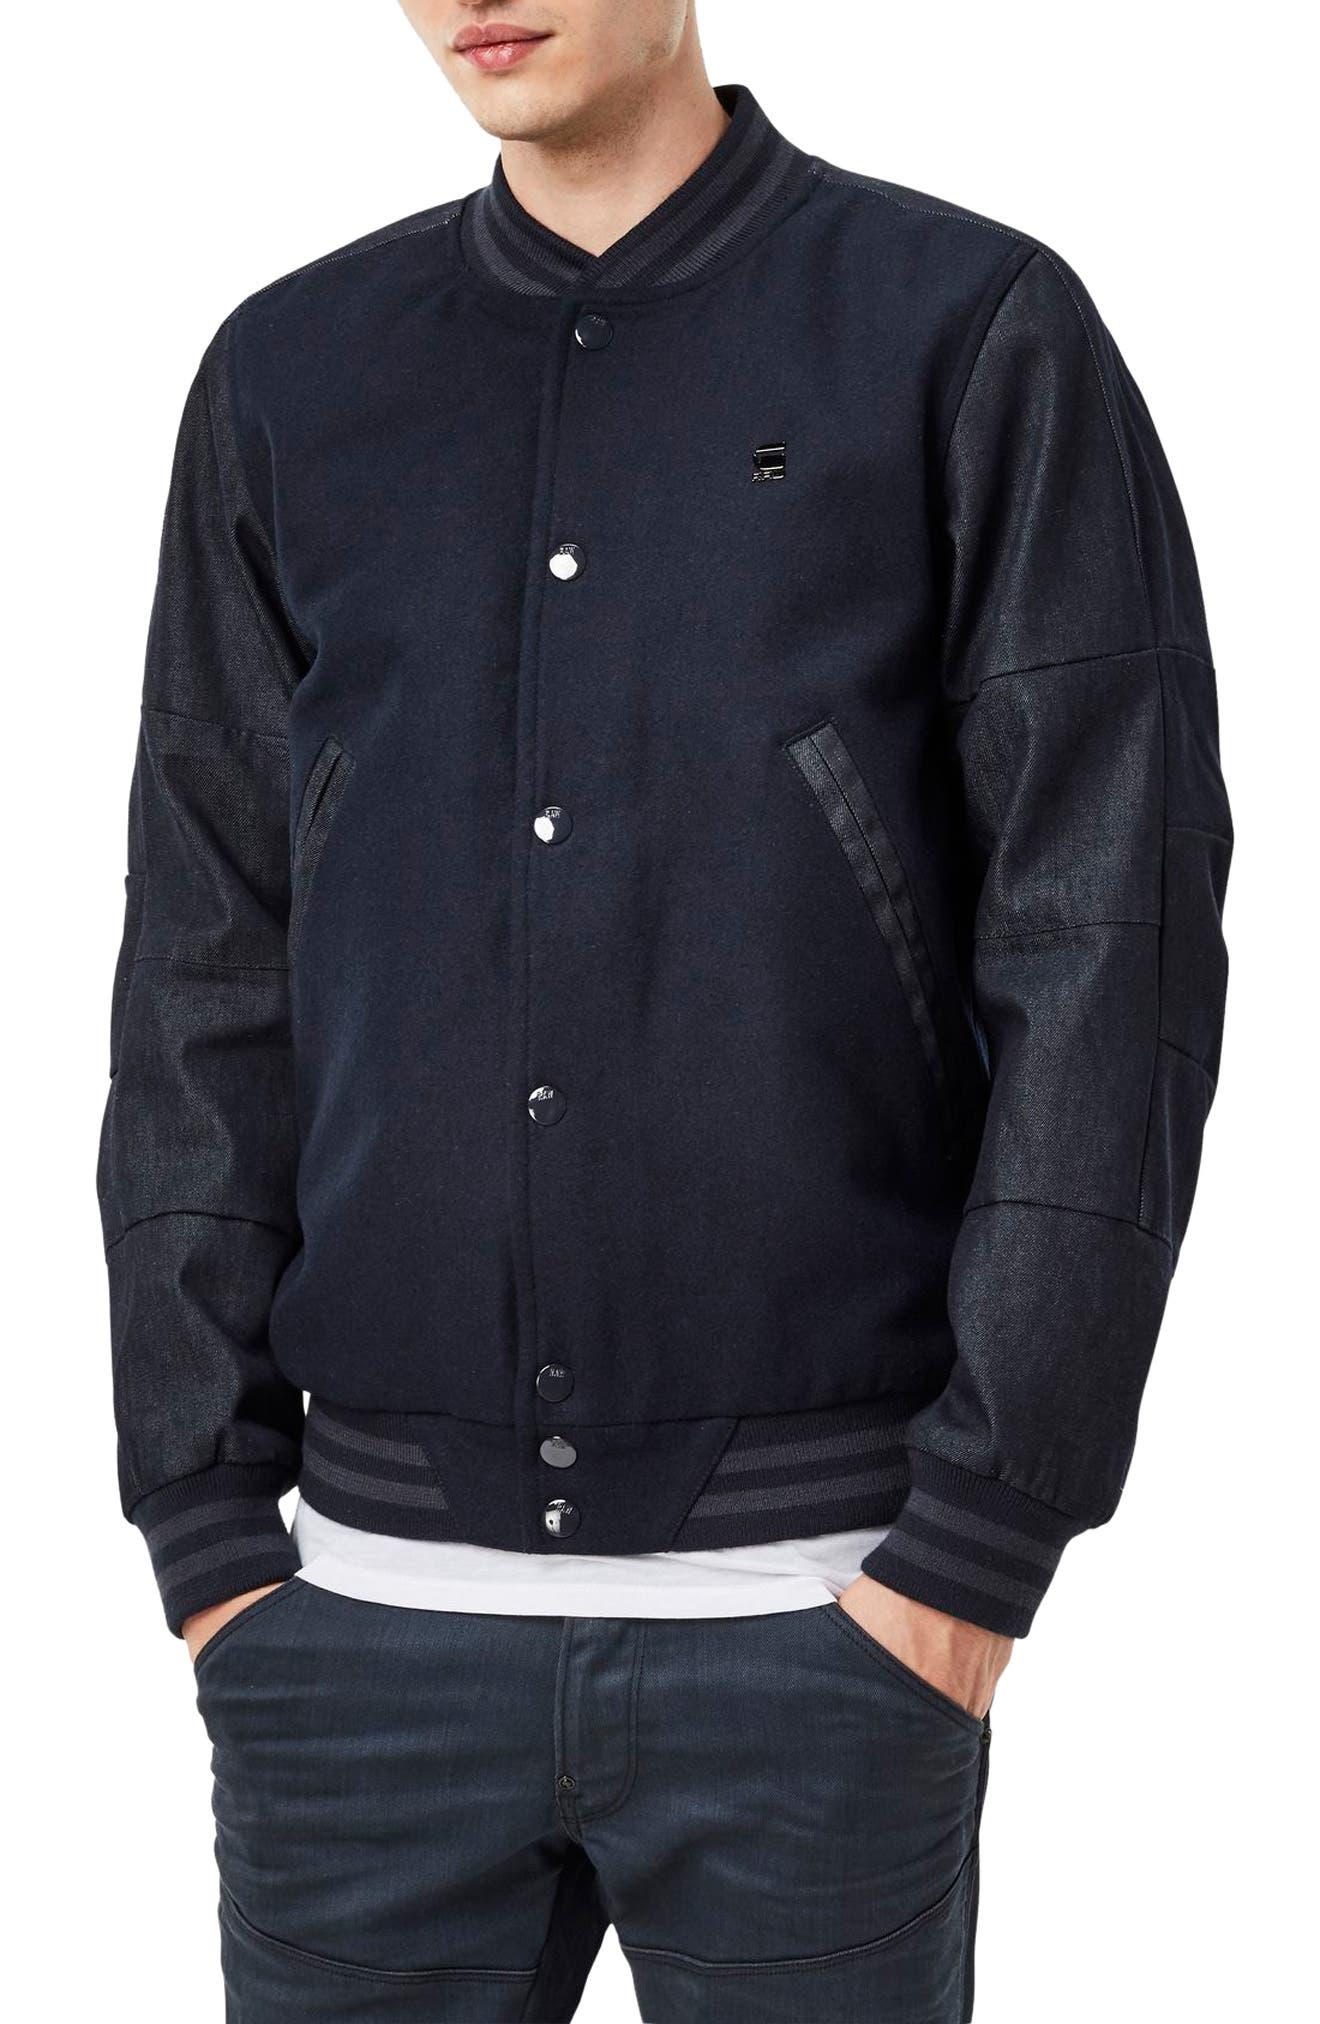 G-Star Raw Rackam Wool Bomber Jacket